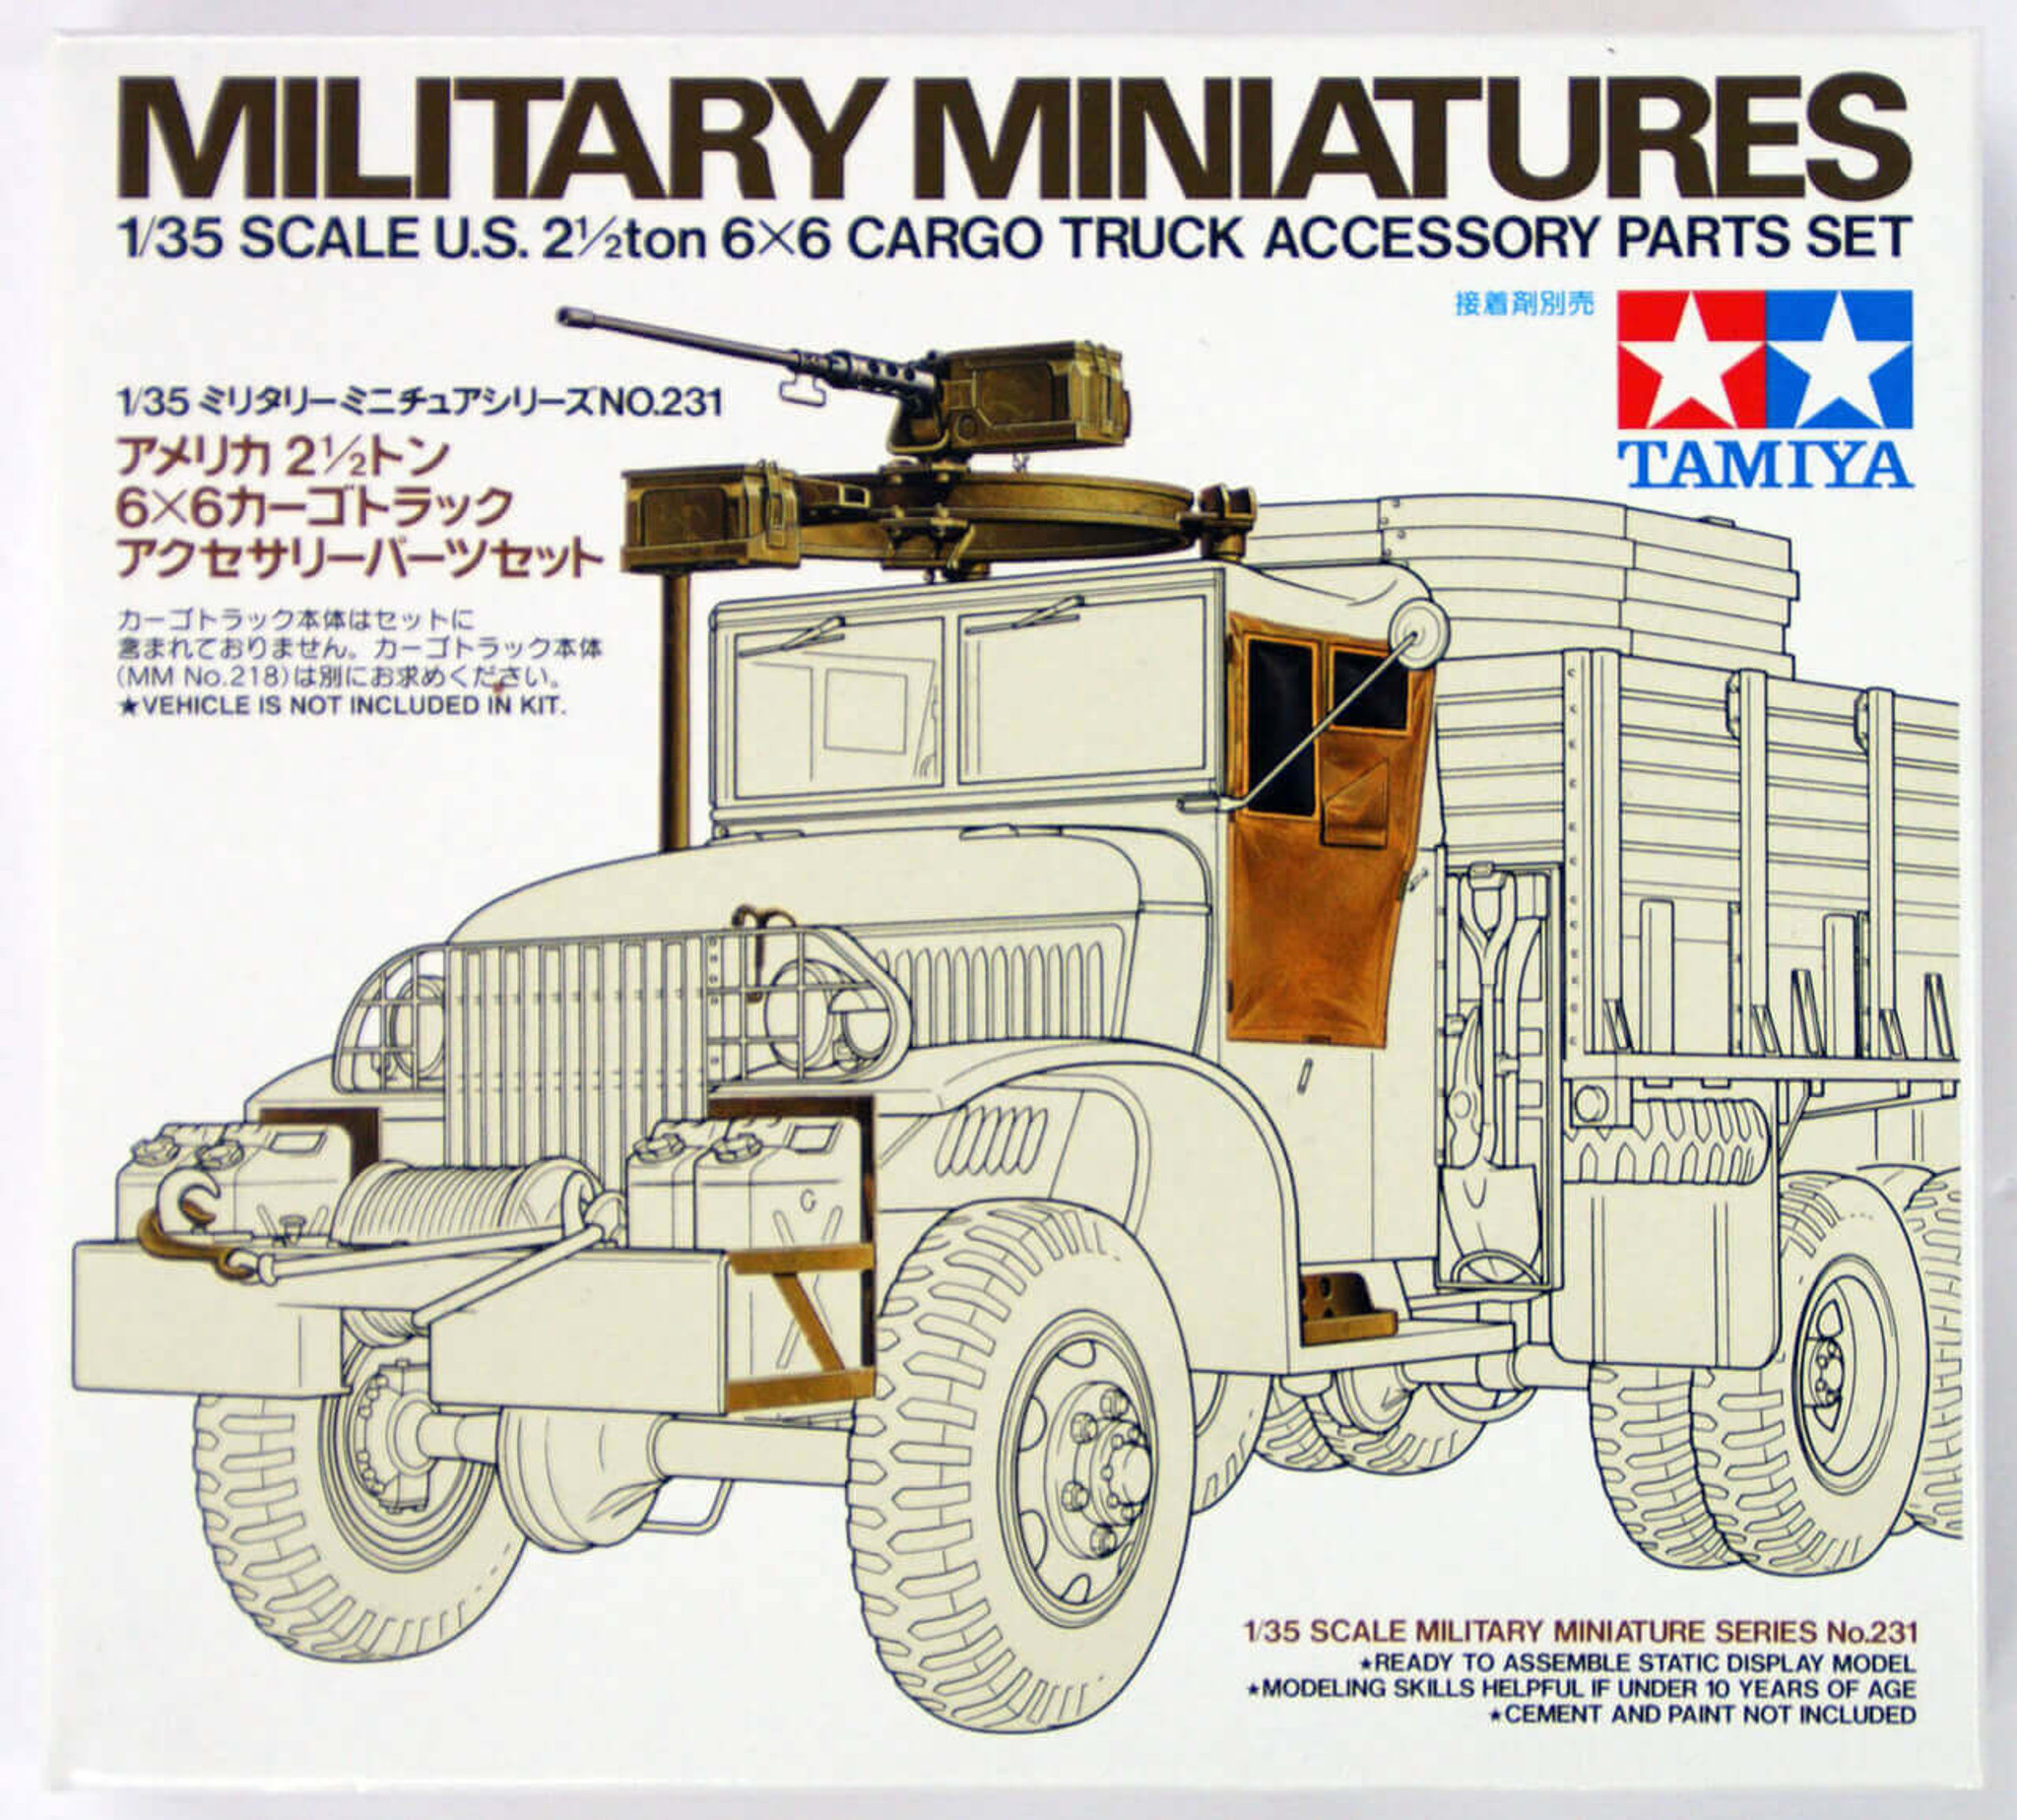 Tamiya 35231 US 2 5 Ton 6x6 Cargo Truck Accessory Set 1/35 Scale Kit